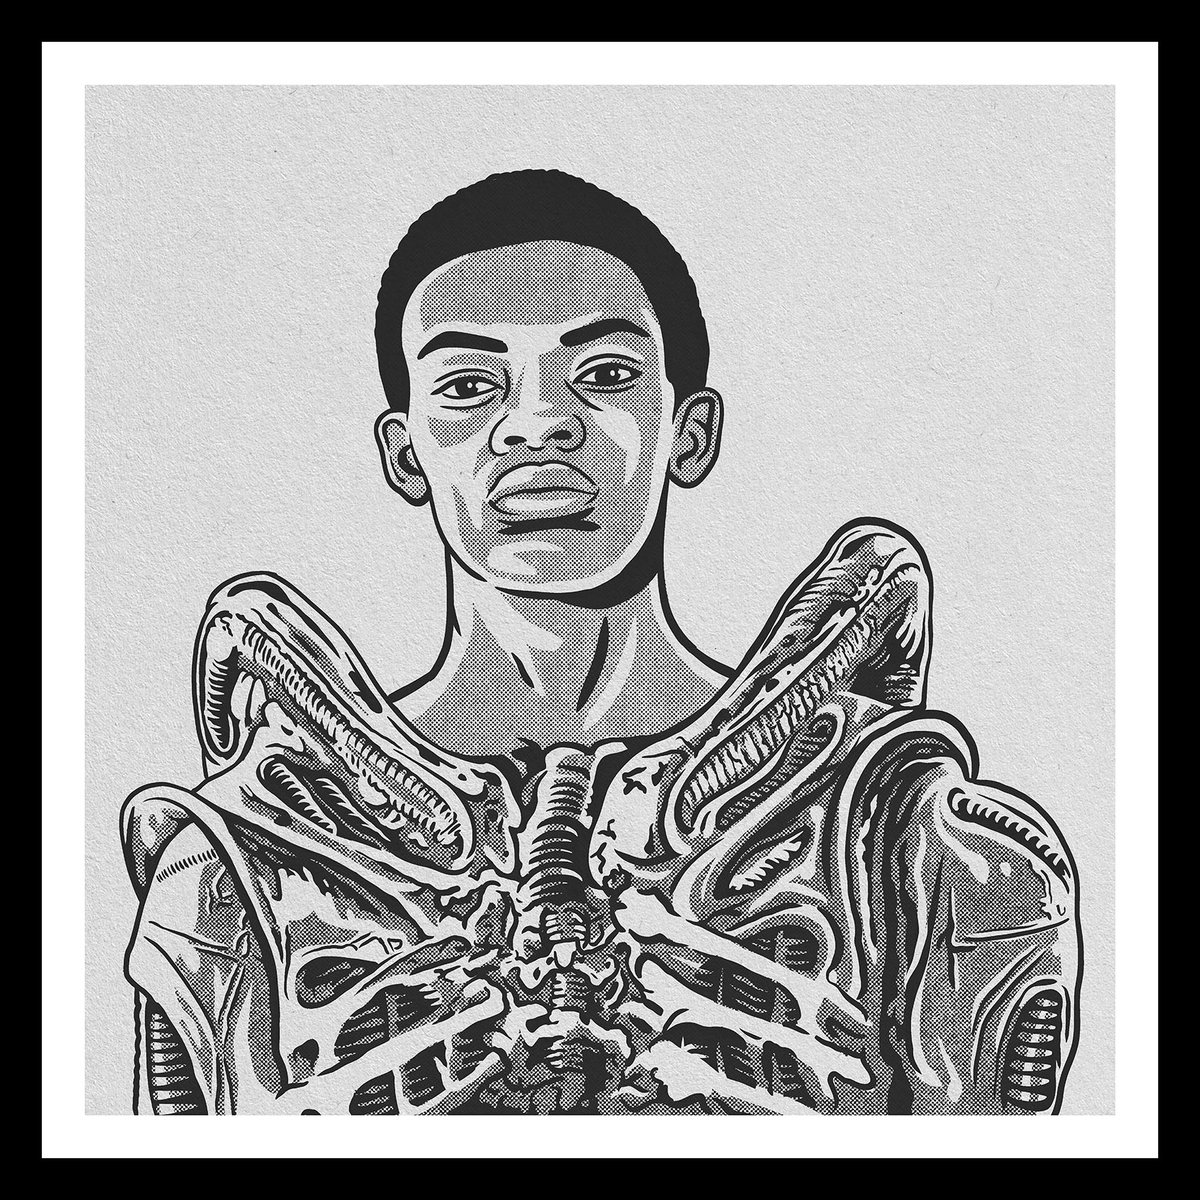 'Bolaji Badejo' … the lad who played The Alien in 'Alien' … Soundtrack: 'Loving The Alien' by Dave Bowie @procreate #procreate #illustration #drawing #painting #ink #ipad #apple #art #fineart #digitalart #popart  #Lagos #Nigeria #actor #ridleyscott #BolajiBadejo @ridleyscottcgpic.twitter.com/iYAysxmzAr